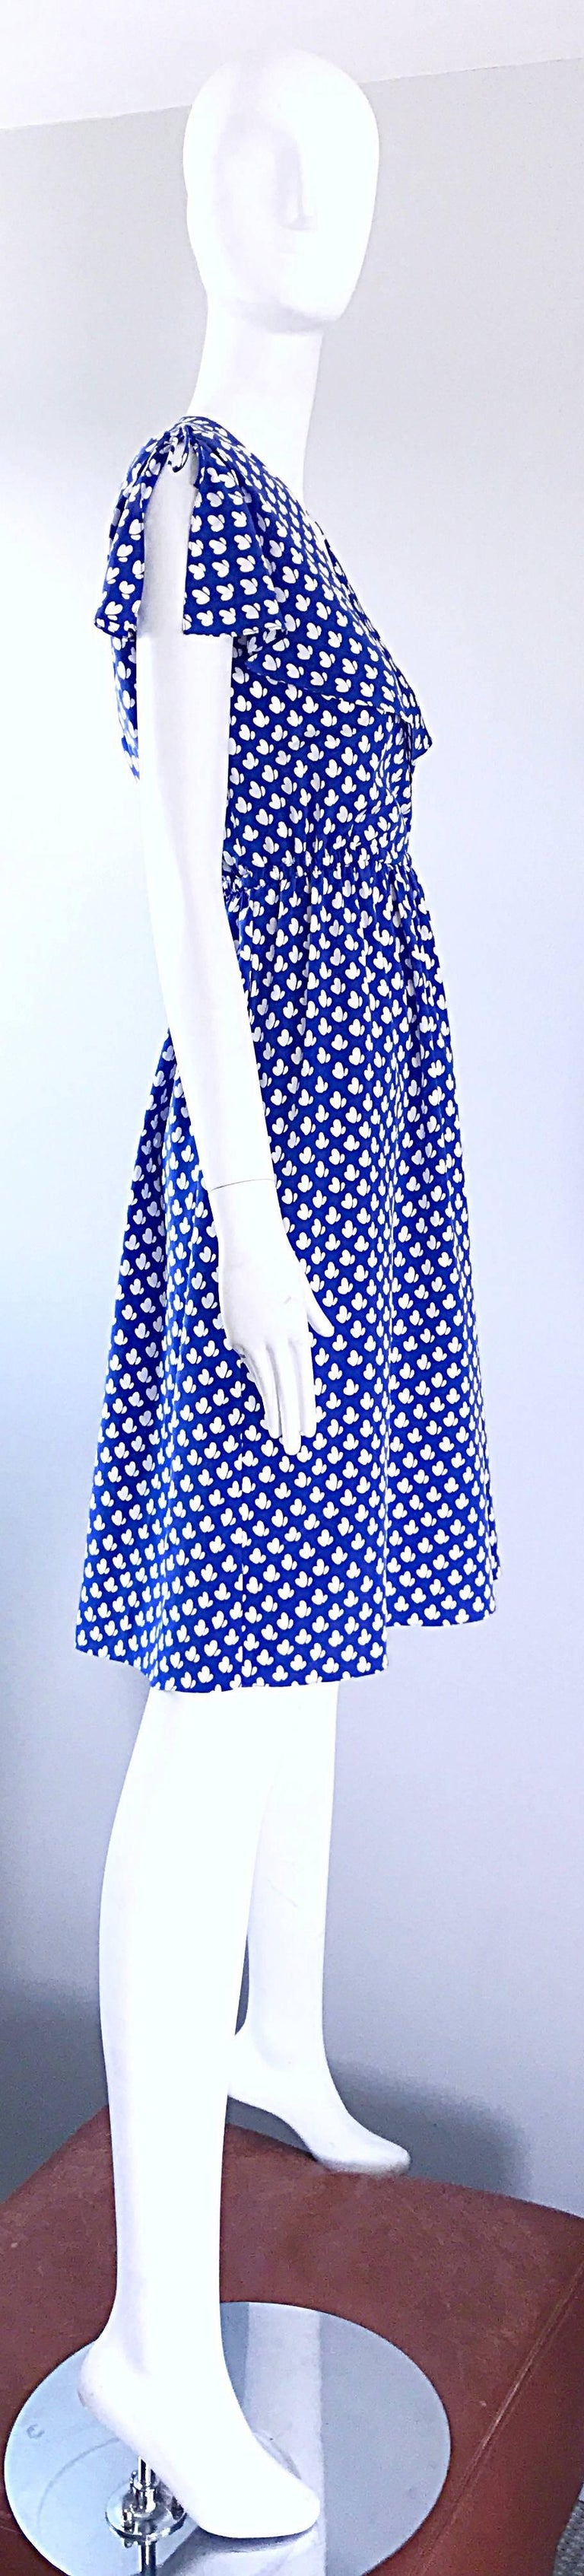 Purple Vintage Pierre Cardin 1970s Blue + White Heart Print Flutter Sleeve 70s Dress For Sale